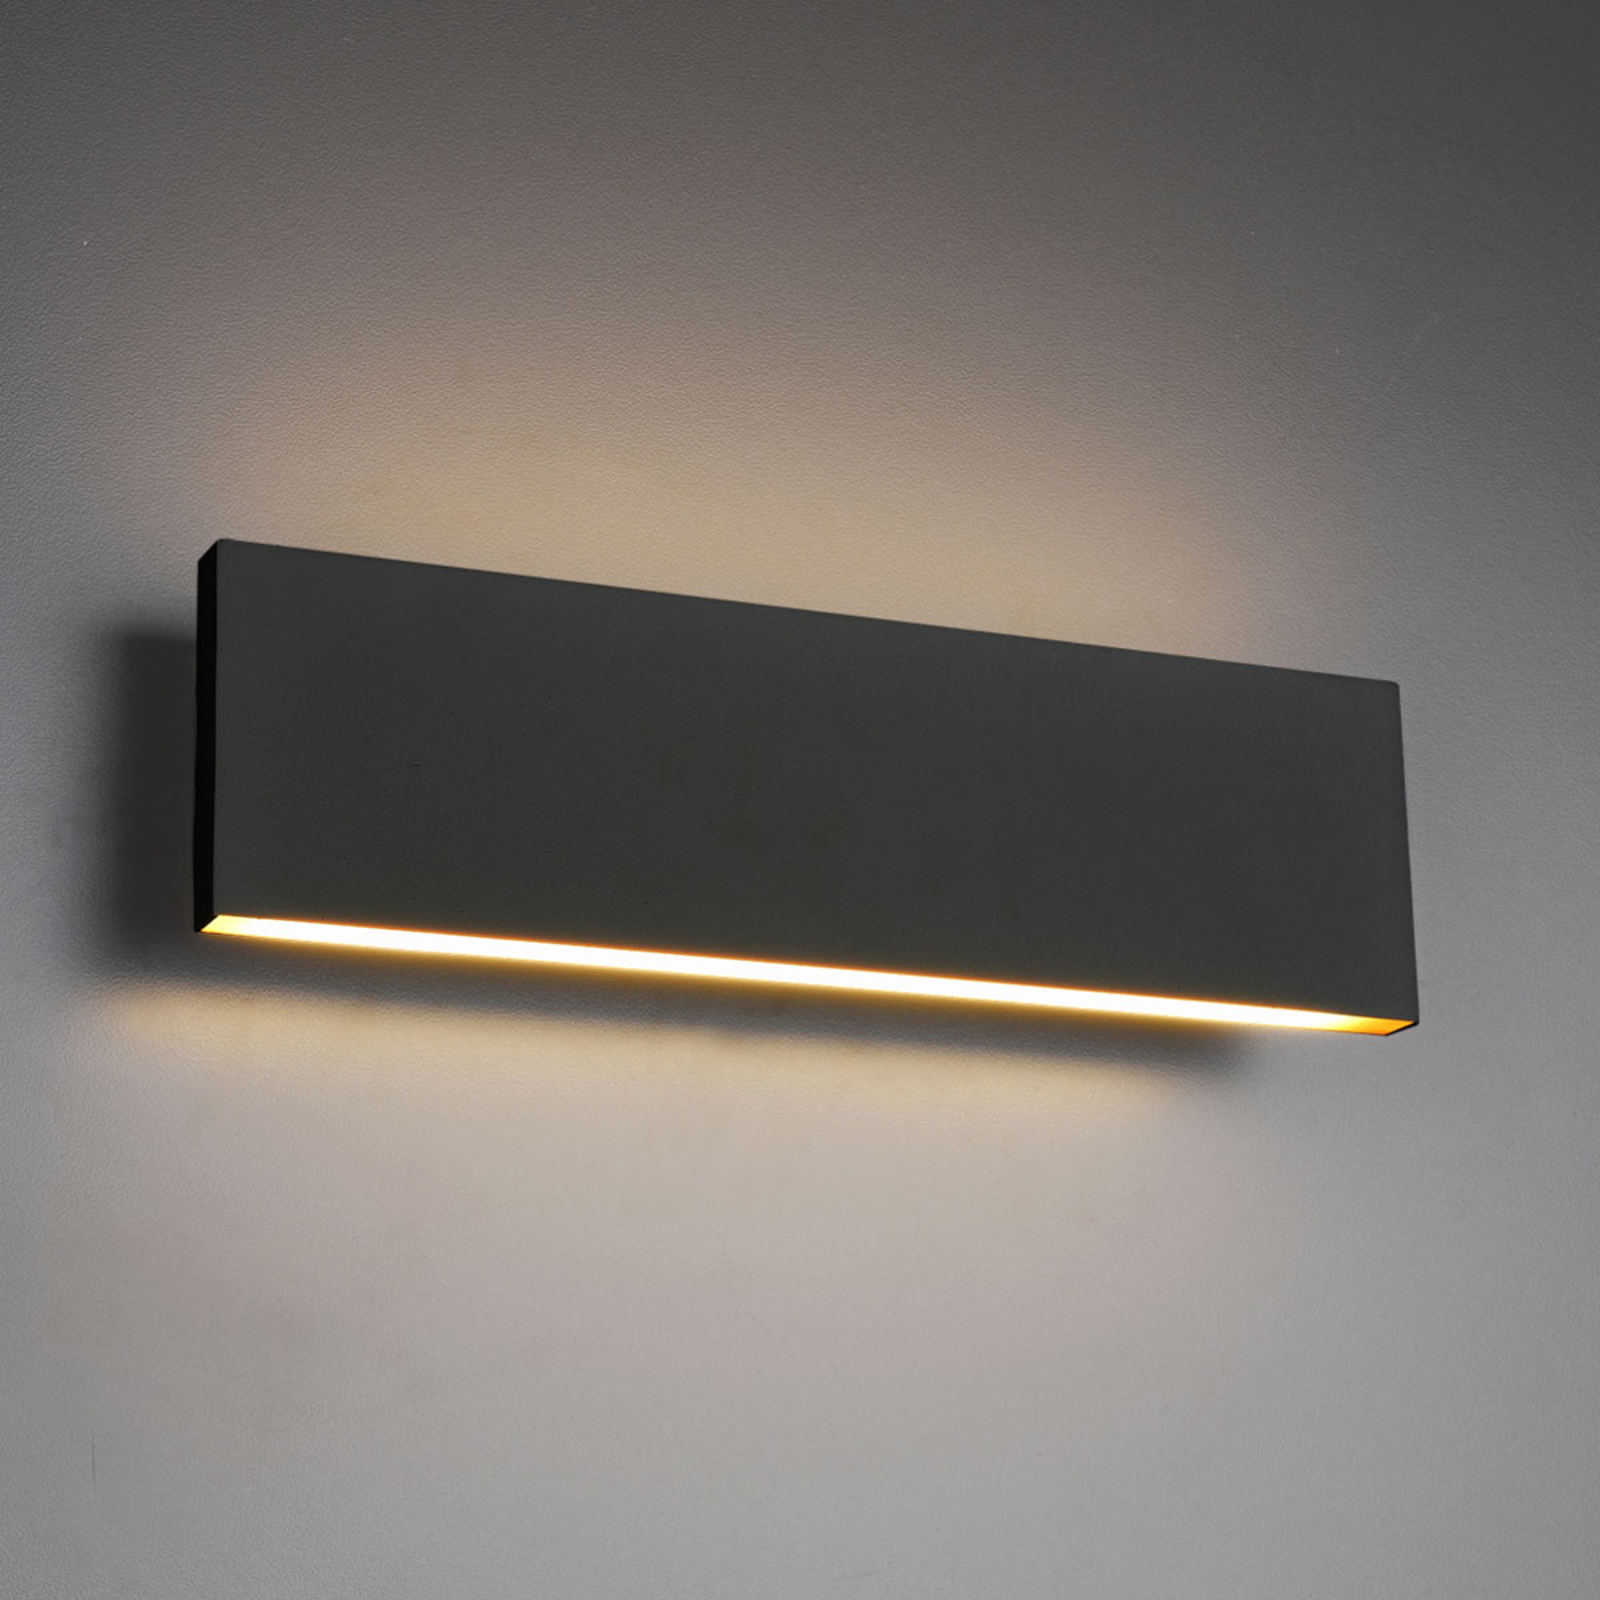 LED wandlamp Concha 28 cm, antraciet